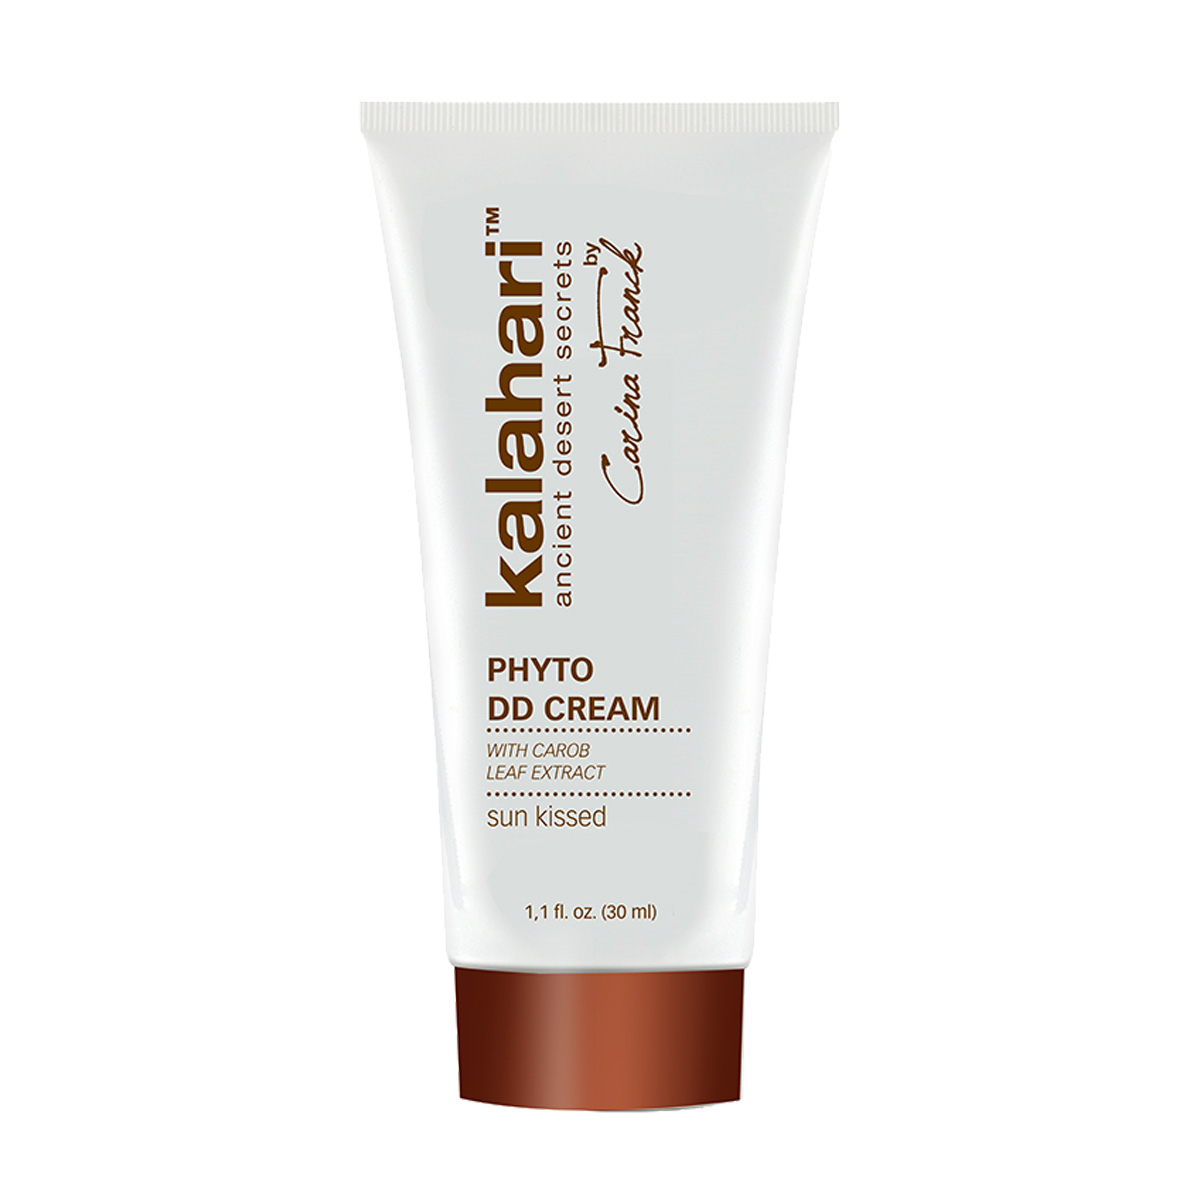 Kalahari Phyto DD Cream Sun Kissed (30ml)